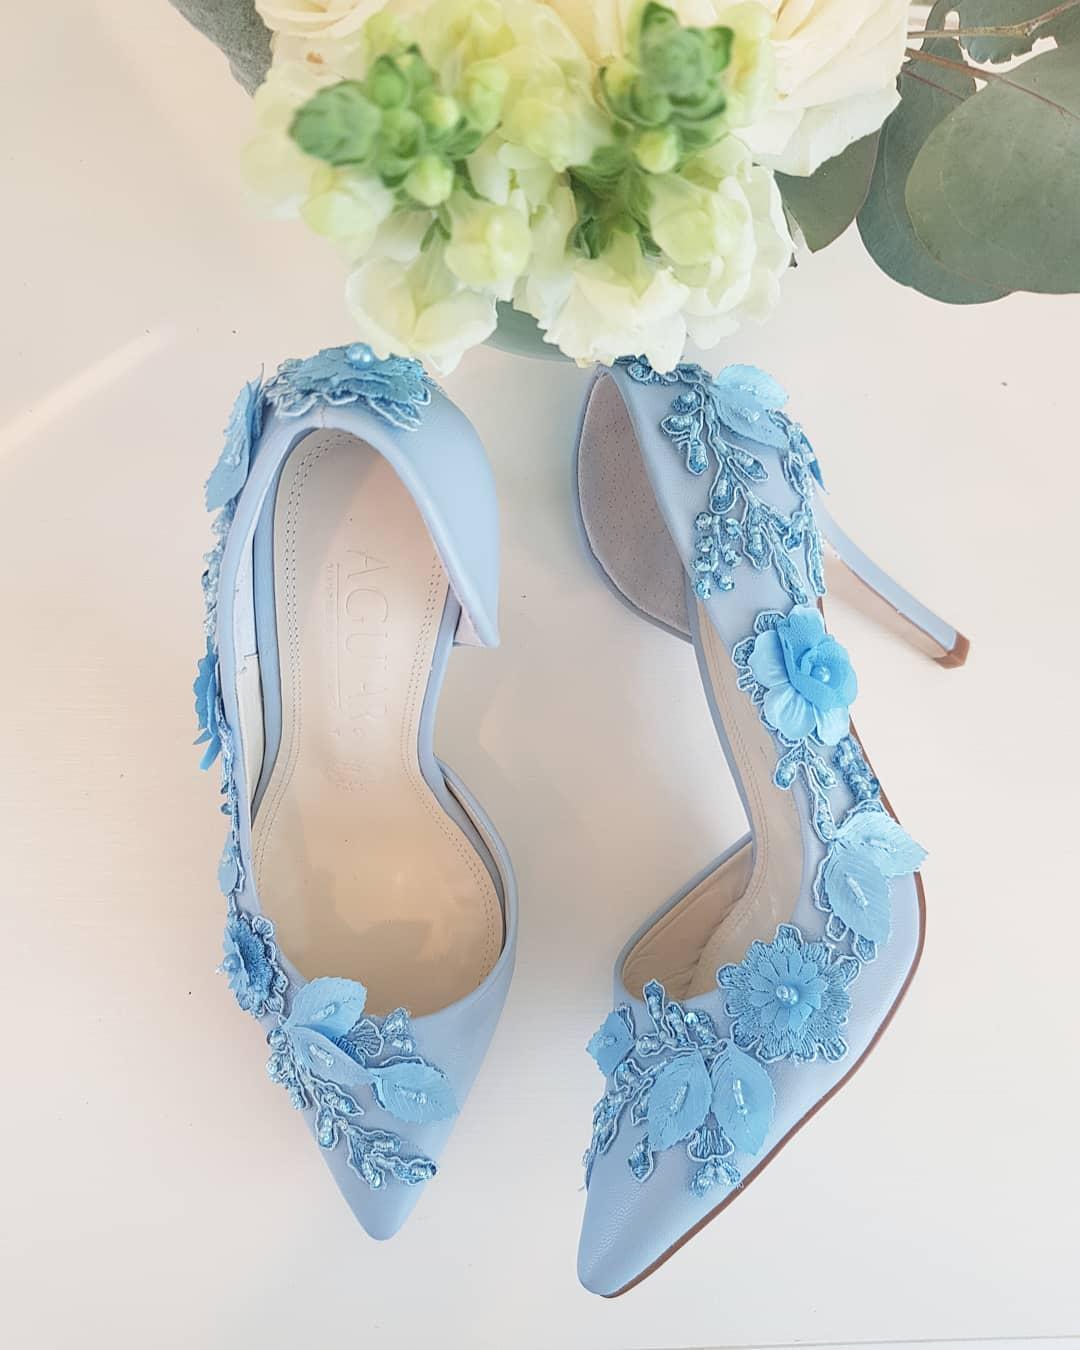 Alluring Aqua Handmade High Heels For Bride